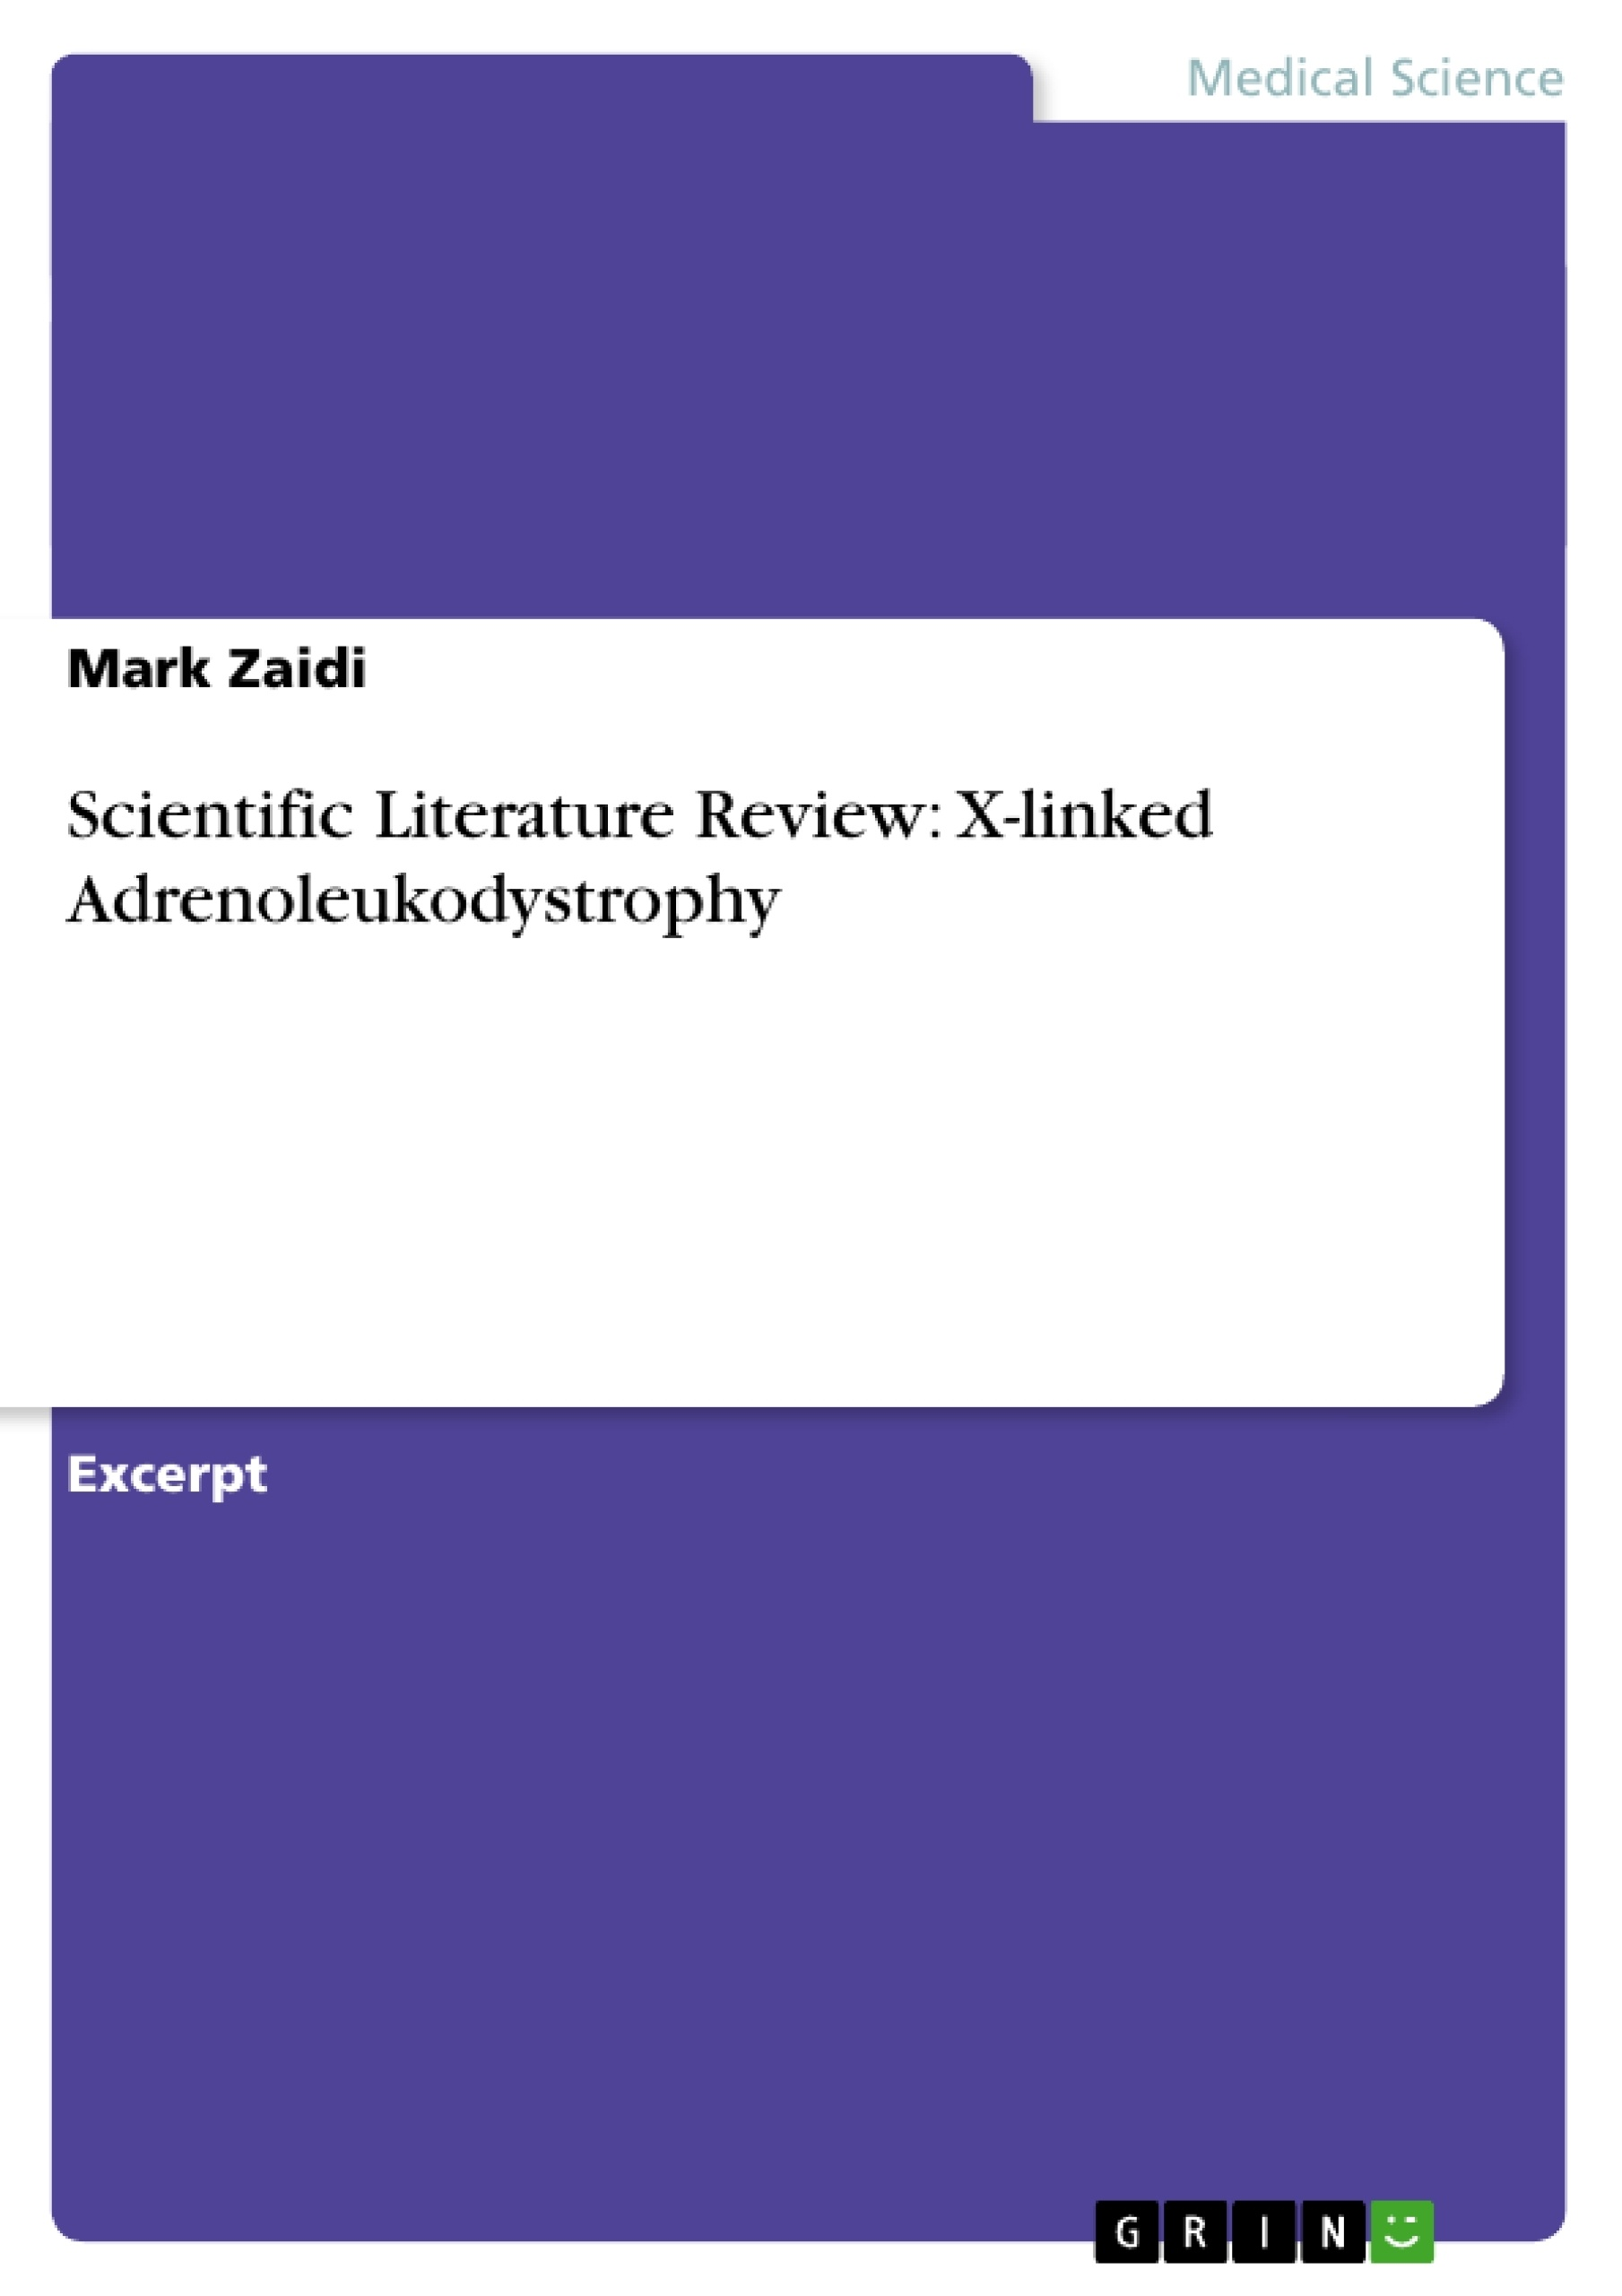 Title: Scientific Literature Review:  X-linked Adrenoleukodystrophy